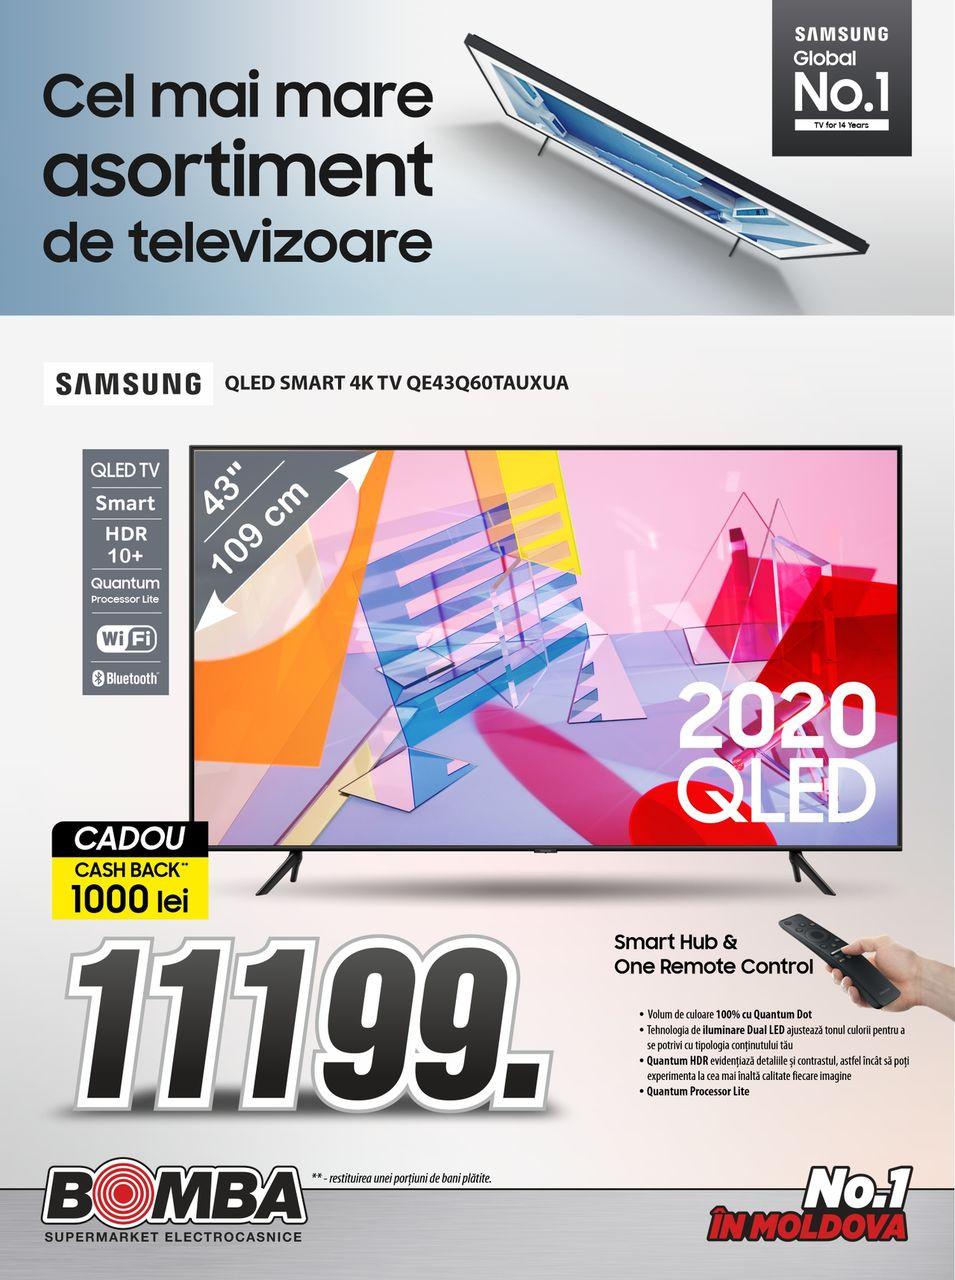 Bomba: Самый большой ассортимент телевизоров Samsung